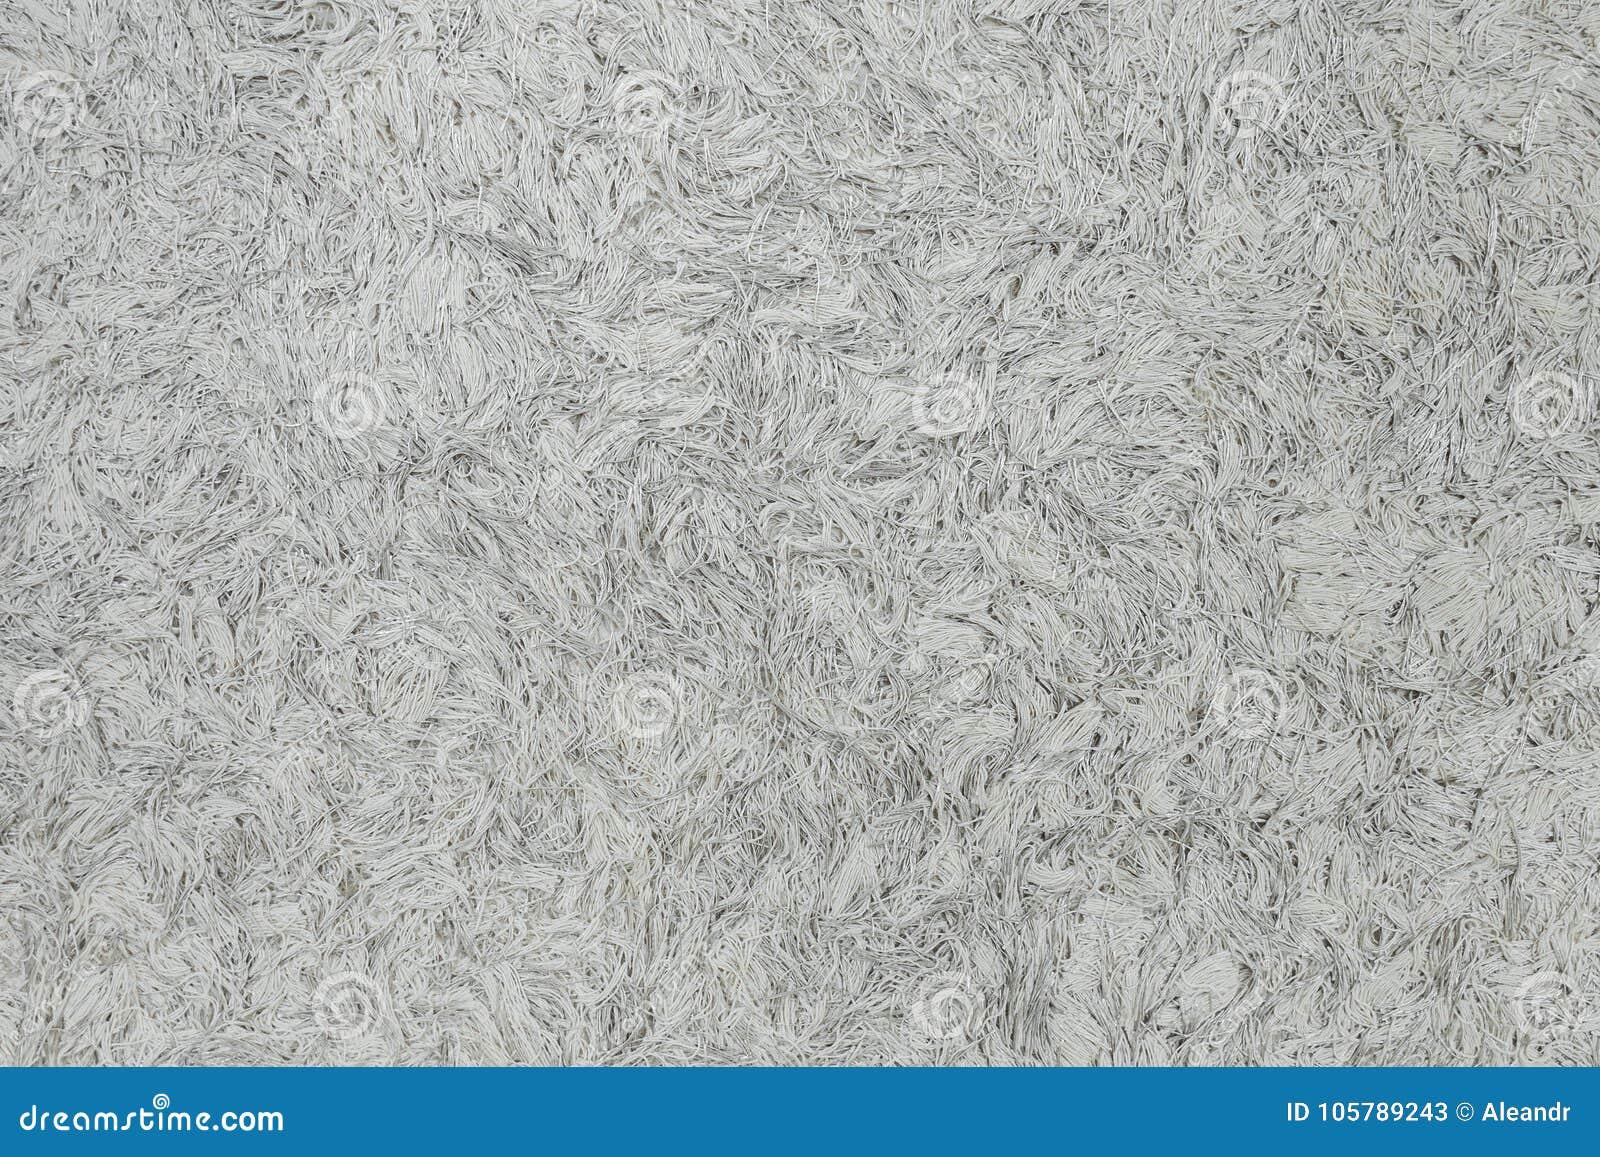 White Fuzzy Texture Liquid Wallpaper In Home Interior Stock